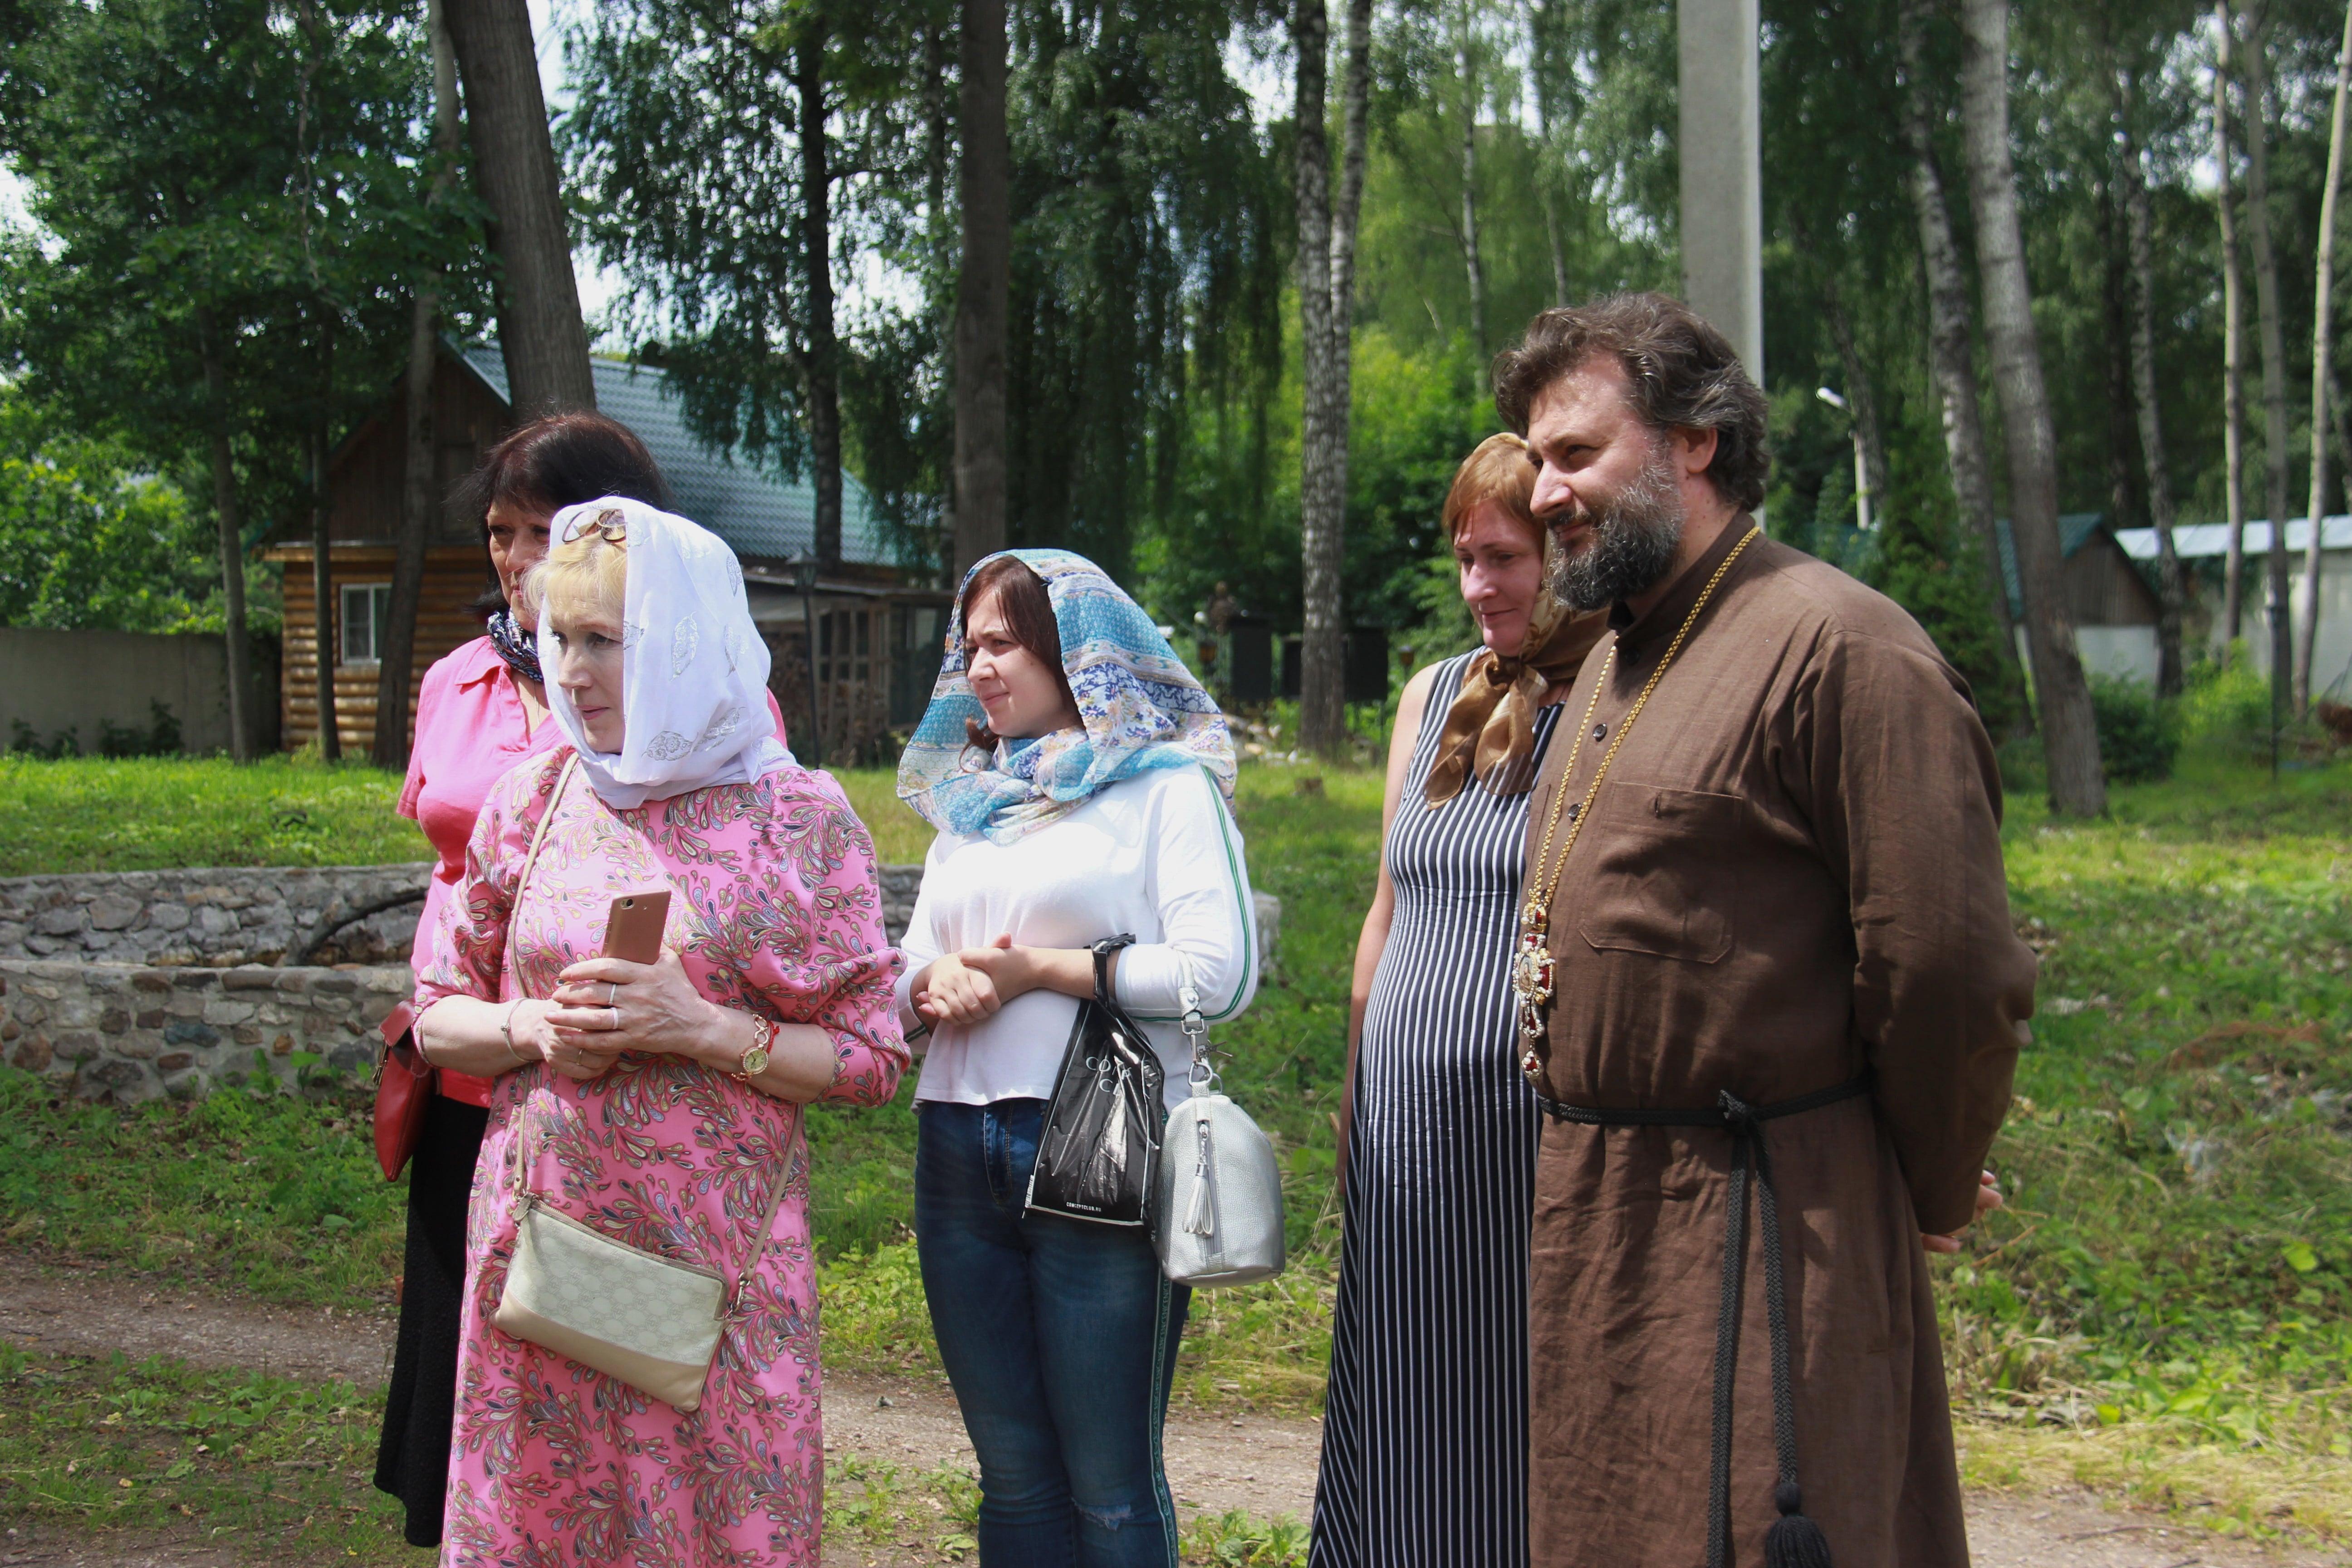 http://monuspen.ru/photoreports/dc0bb6c6b938fb5702a45b5049fc5f3i.JPG